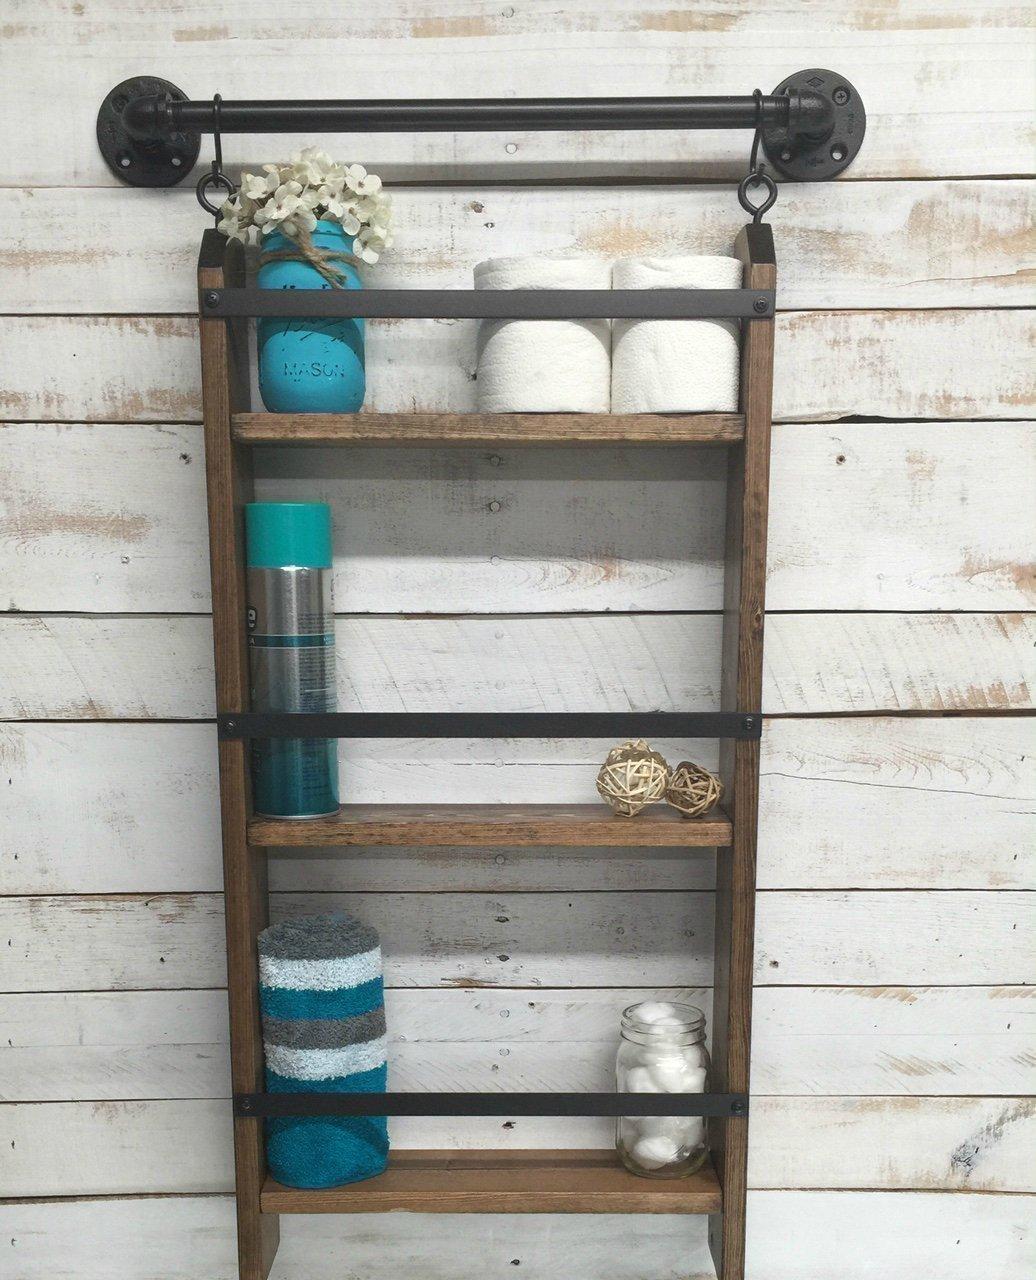 online retailer 791a6 e7ddf Bathroom ladder shelf, rustic bathroom shelf, industrial shelf, farmhouse  shelf, cottage chic, home décor, shelf w/pipe towel bar